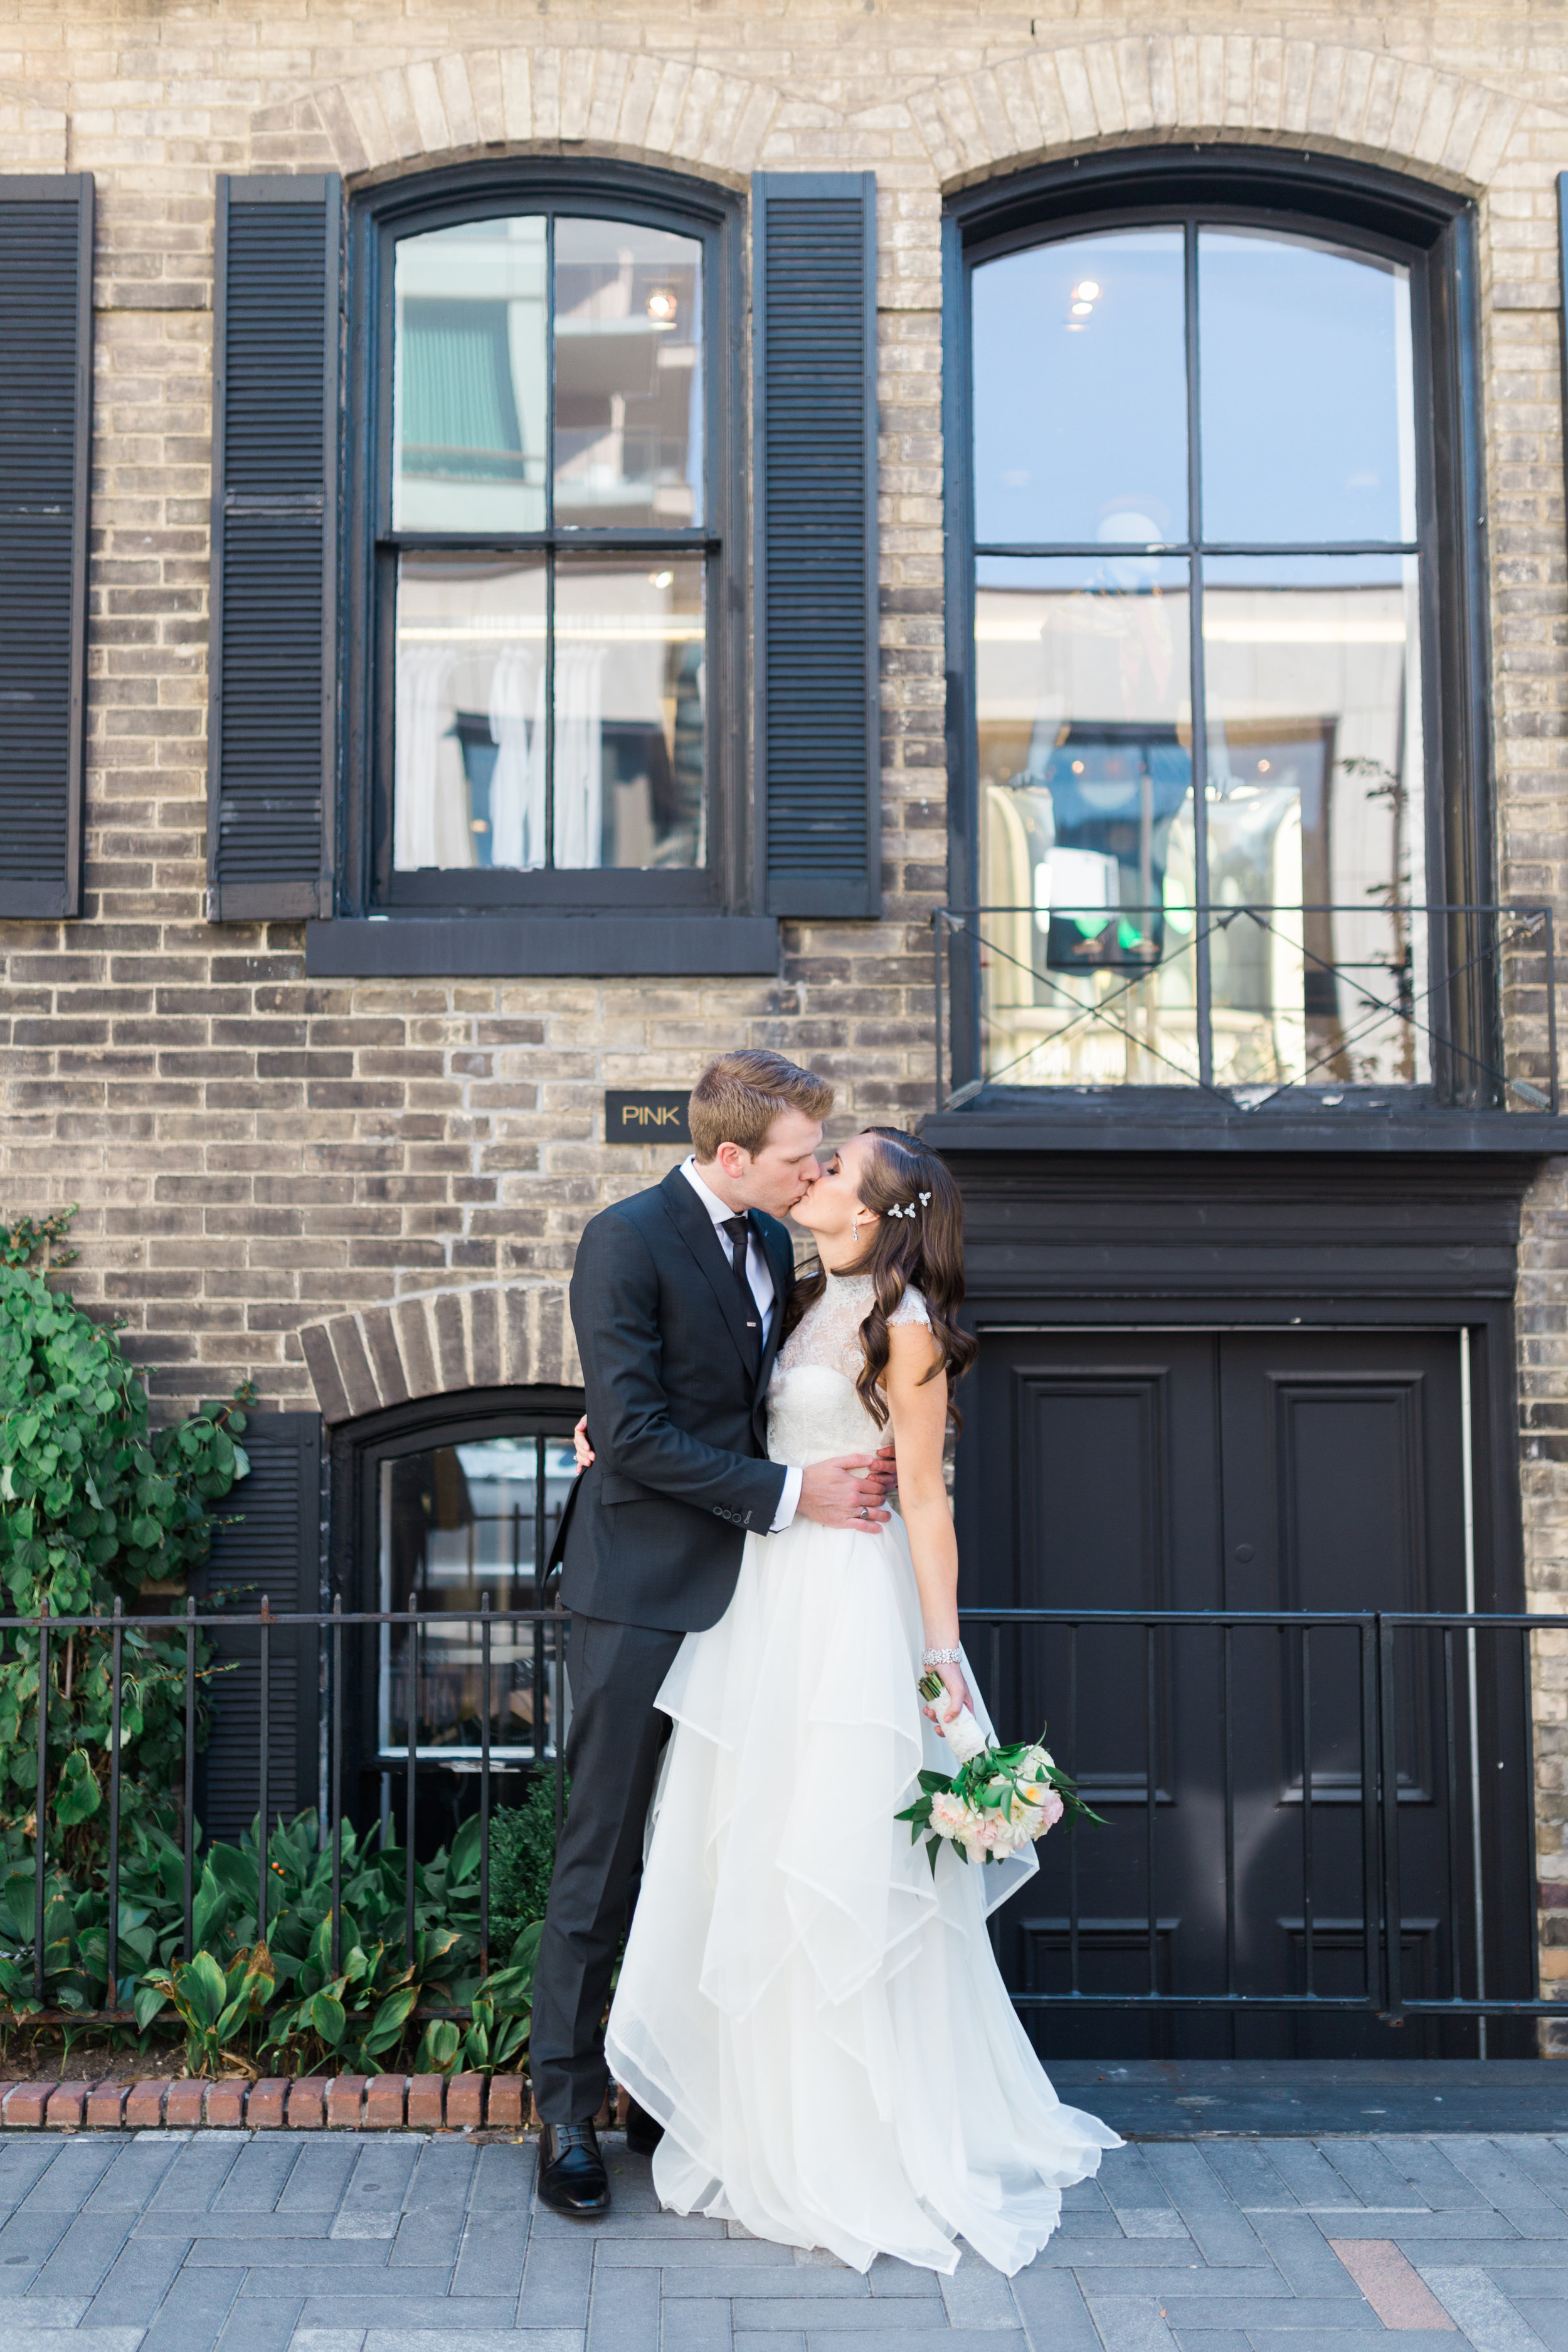 Toronto Fine Art Photographer - Yorkville Wedding - Bride & Groom Portraits-2.jpg